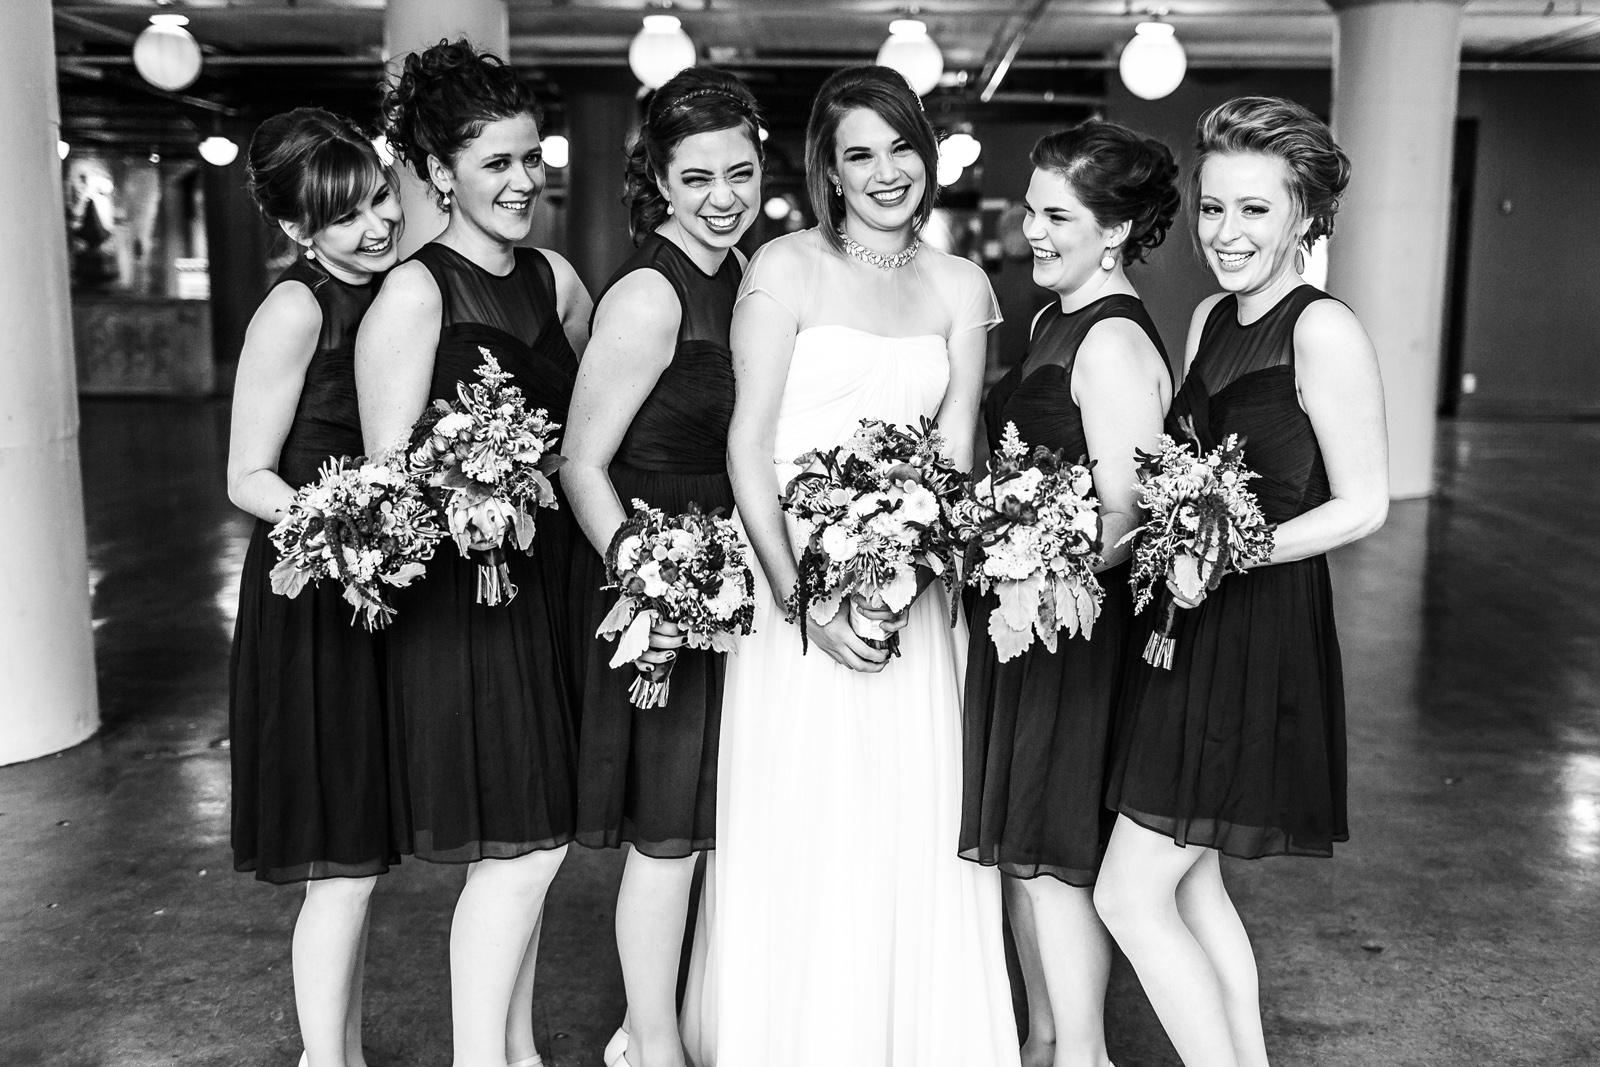 Oldani Photography-St Louis-Wedding Photos-wedding photographer-wedding party-City Museum_20141122_16155128.jpg